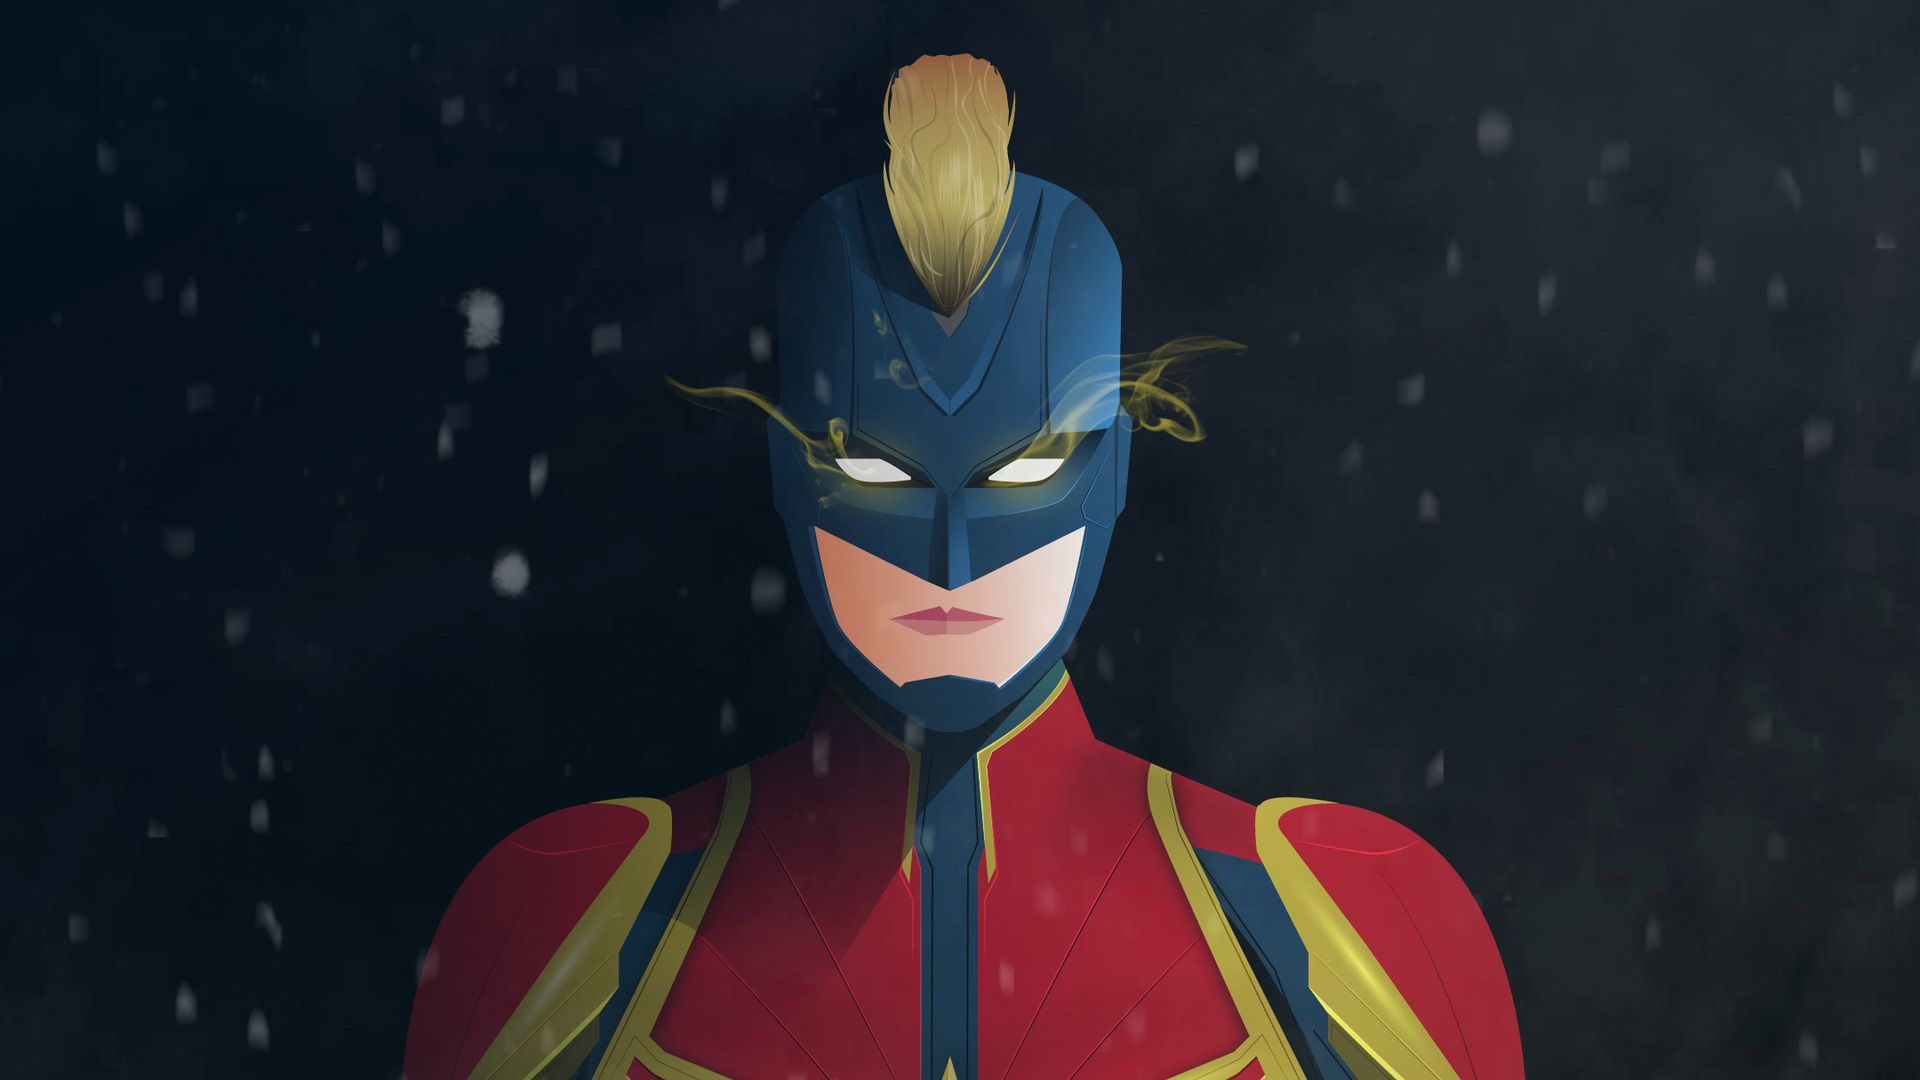 Captain Marvel Digital Artwork 4k Wallpaper Superheroes Wallpapers